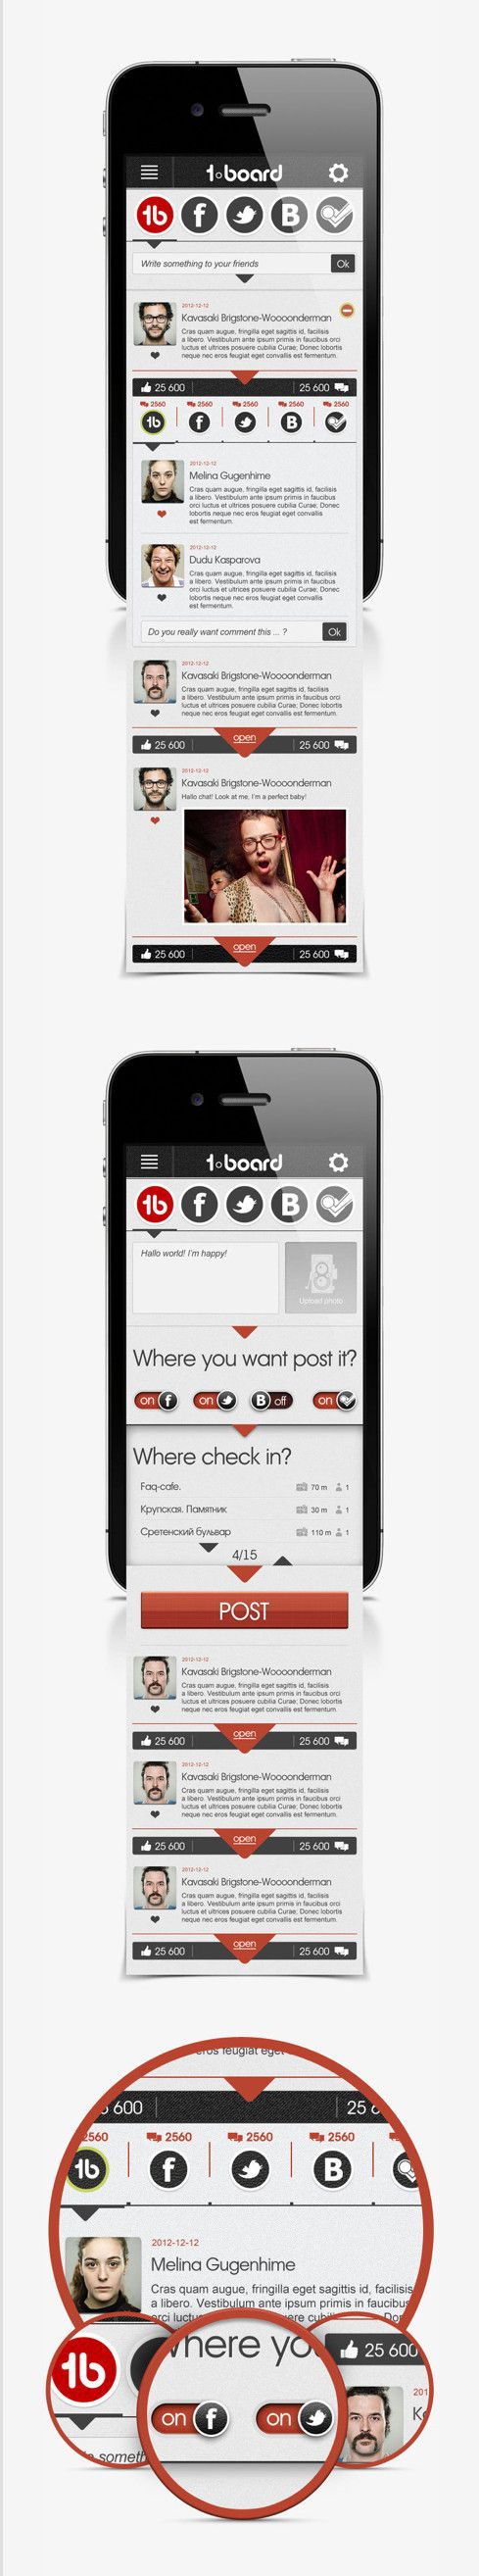 #mobile #ui #behance #digital on Twitpic